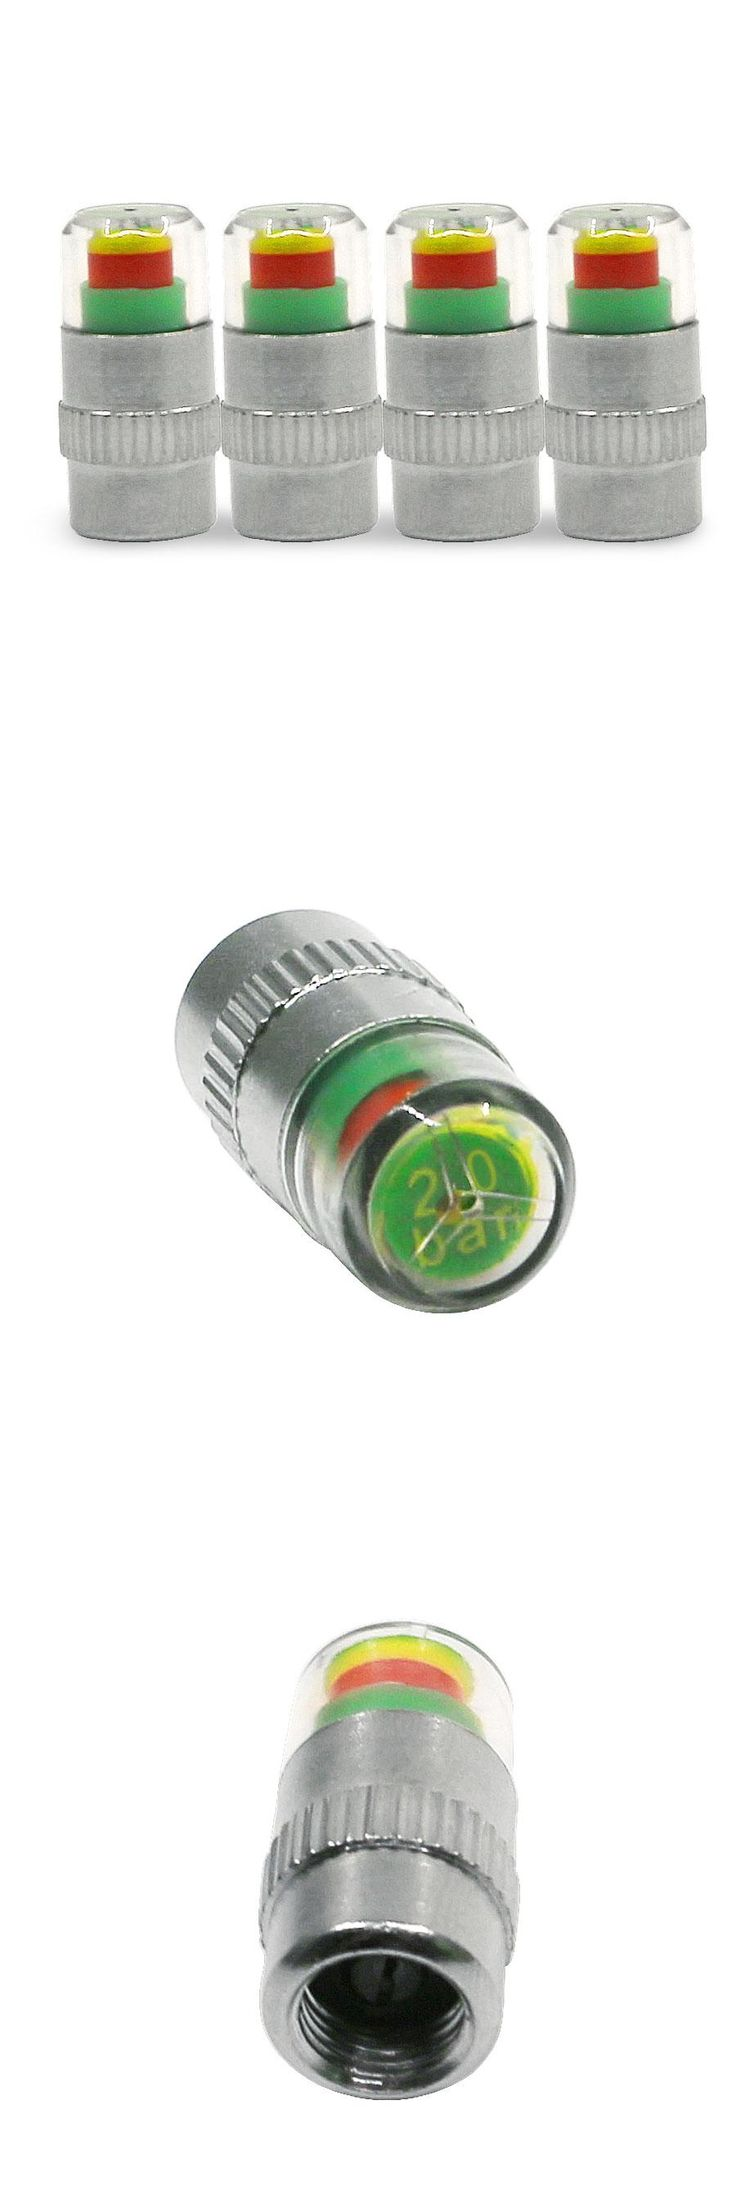 [Visit to Buy] 4PCS/set 2.0Bar 30PSI Auto Car Tire Pressure Monitor Valve Stem Caps Sensor Indicator Eye Alert Diagnostic Tools Kit #Advertisement